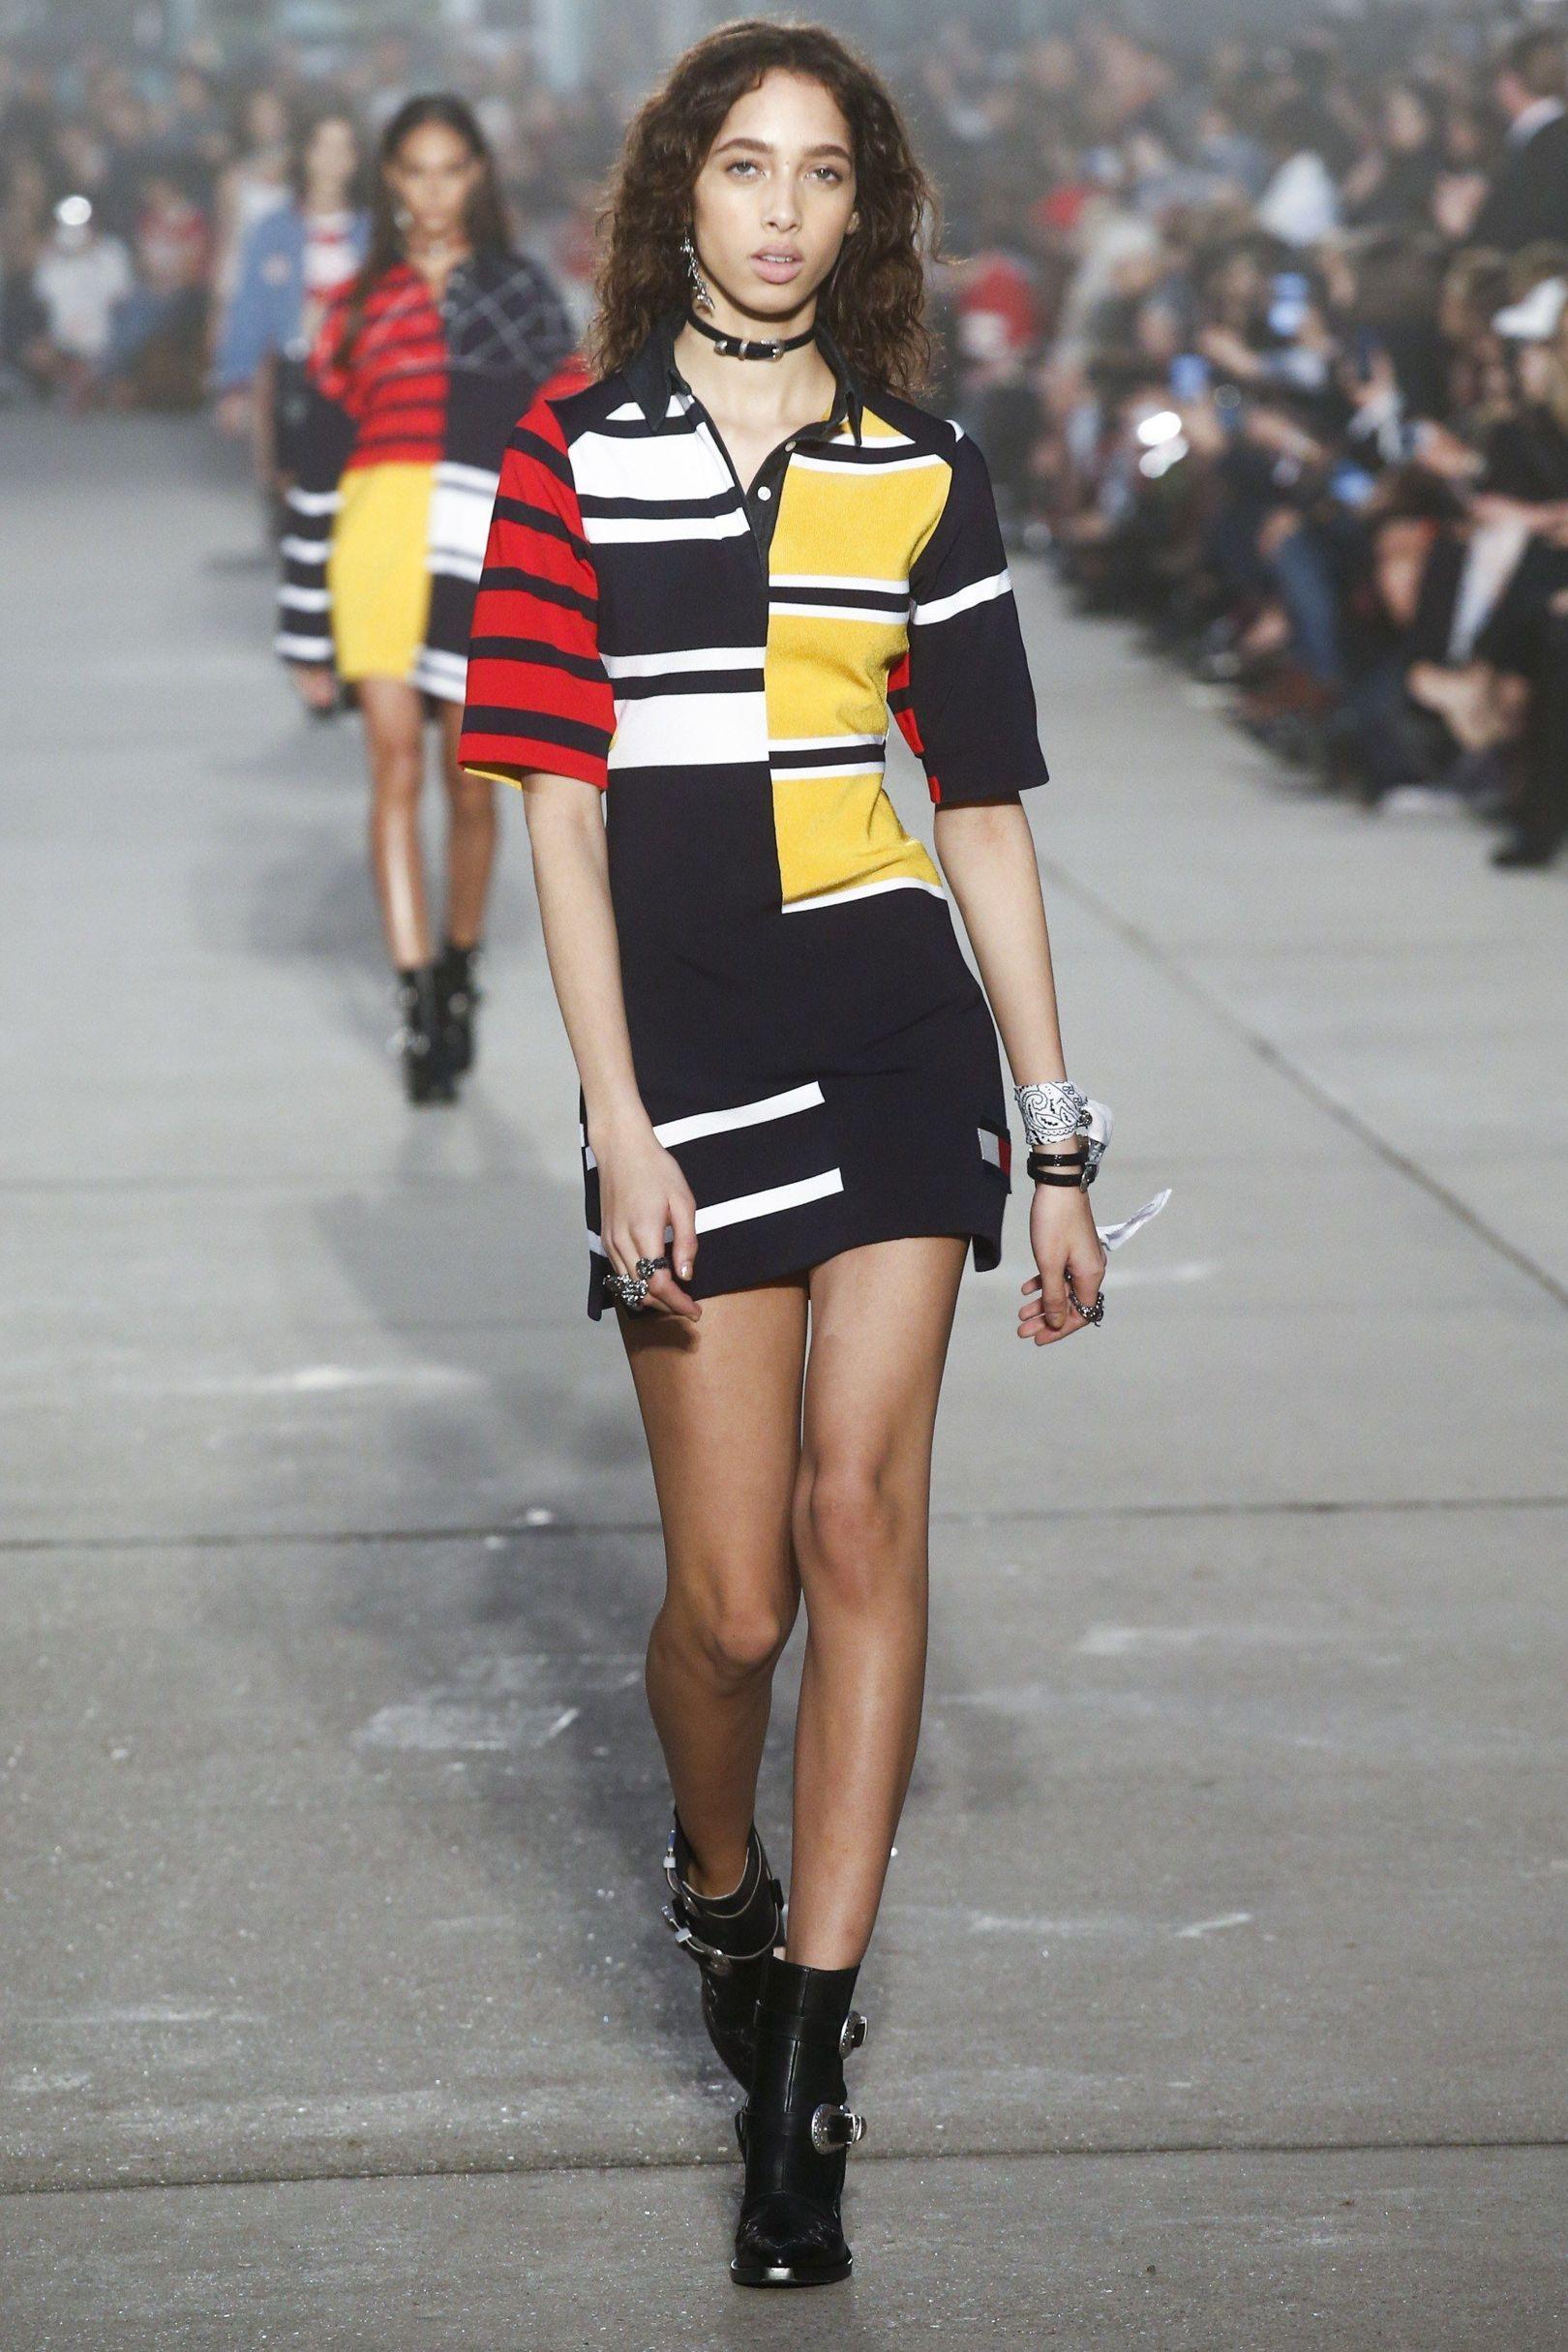 Tommy Hilfiger Spring 2017 Ready-to-Wear Fashion Show